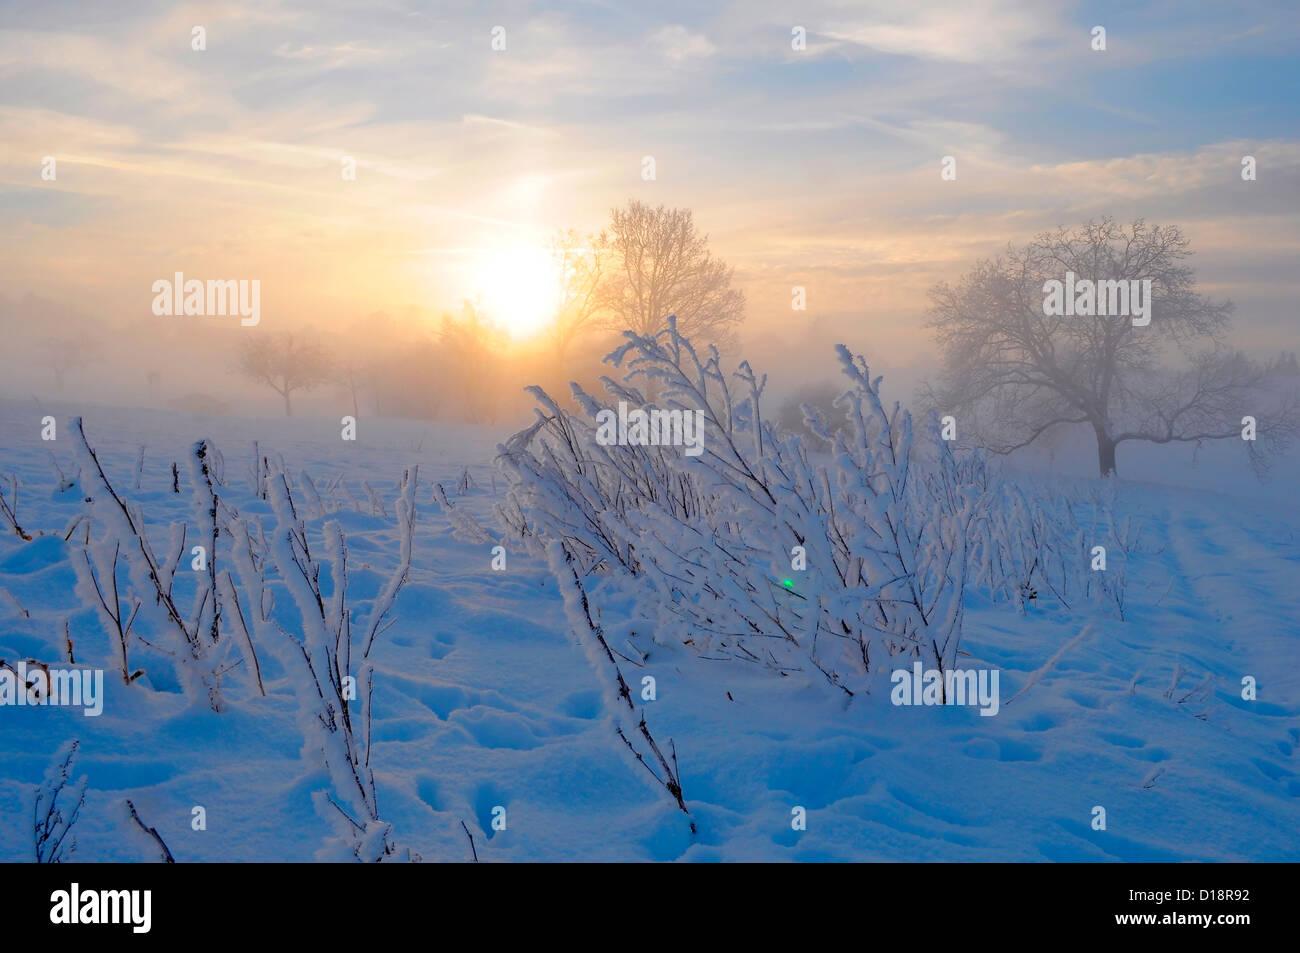 Sunrise with snow at Maulbronn, morning mood, fog with snow, dirt road with snow, sun with rays, snow, landscape, - Stock Image